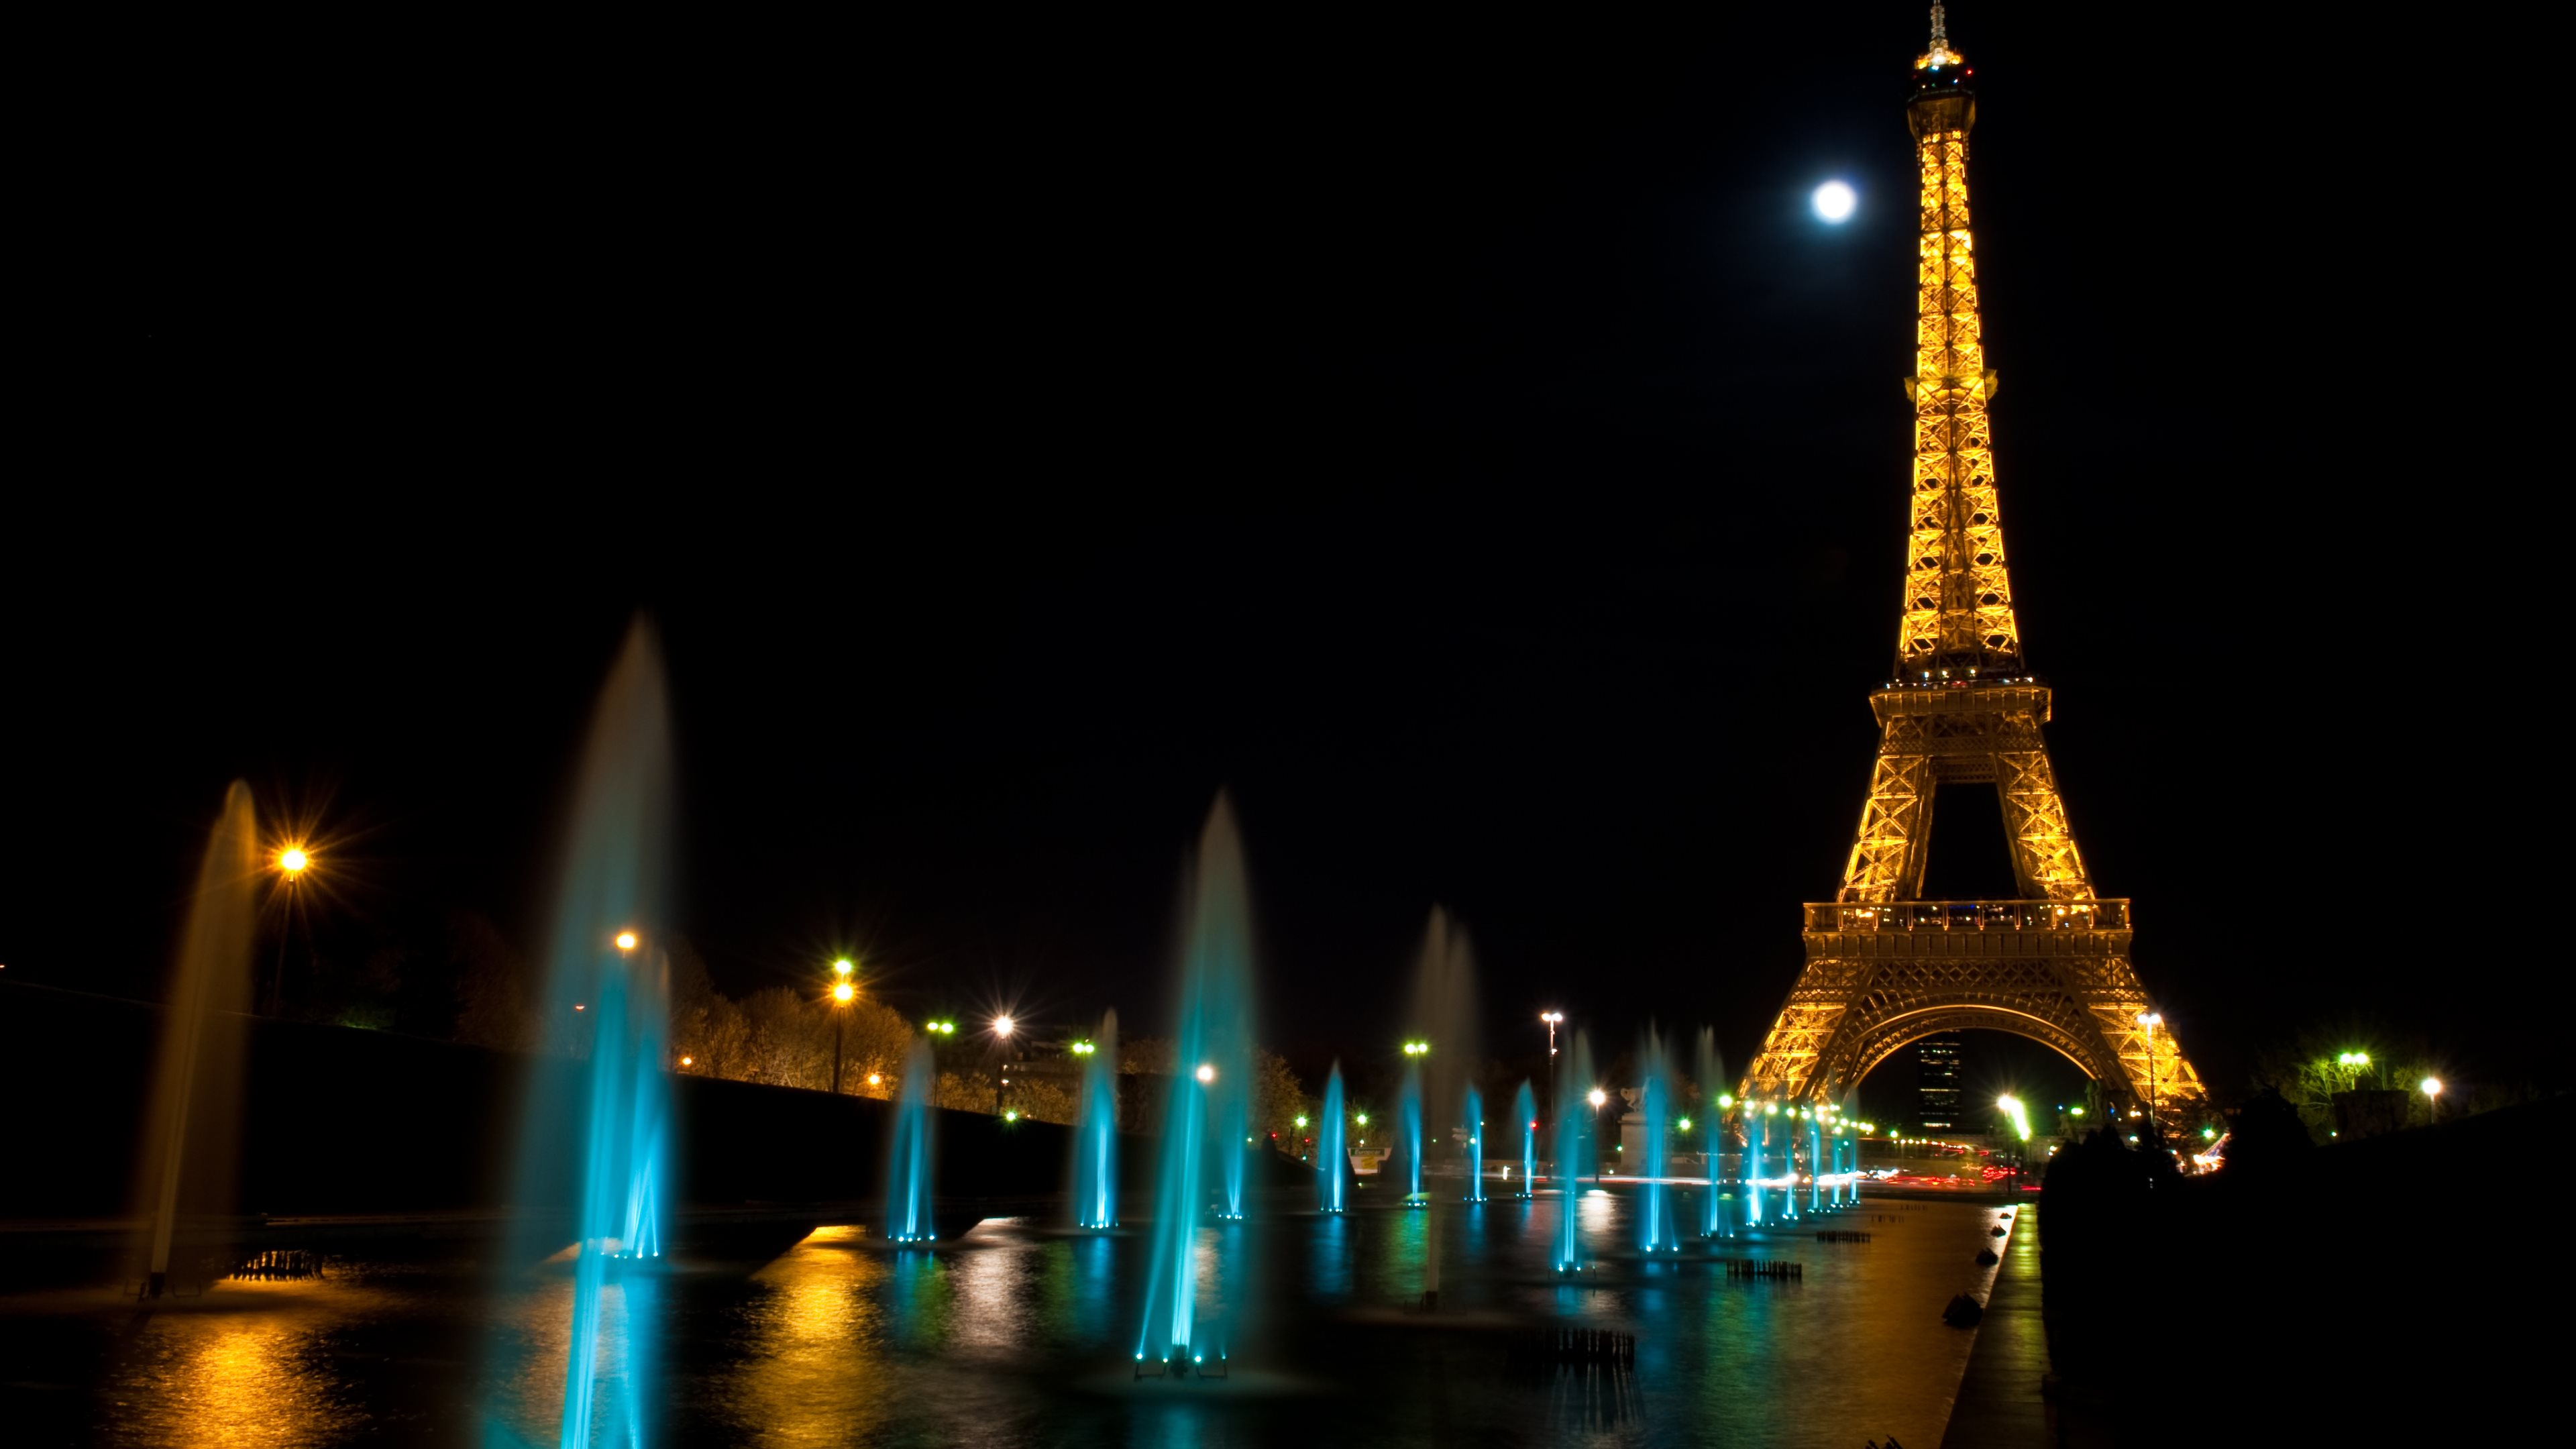 Beautiful Eiffel Tower Paris At Night Wallpaper Wallpapersafari